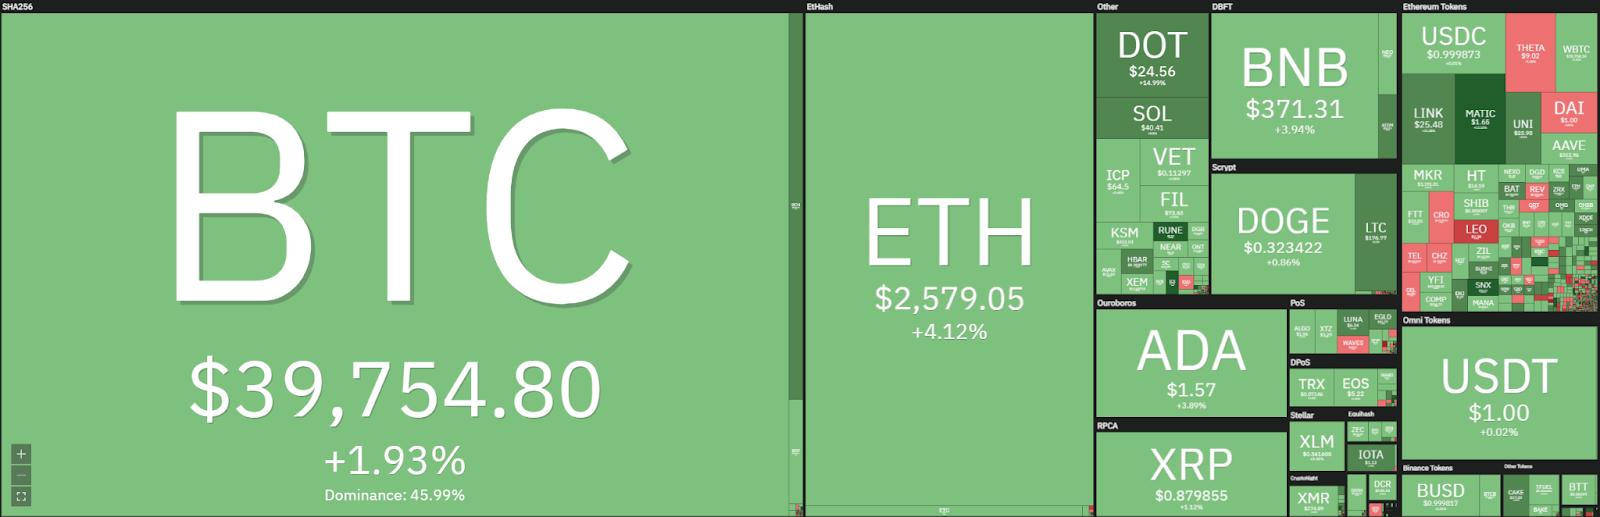 Bitcoin price analysis: Bitcoin still trades around $40,000, reversal incoming? 1